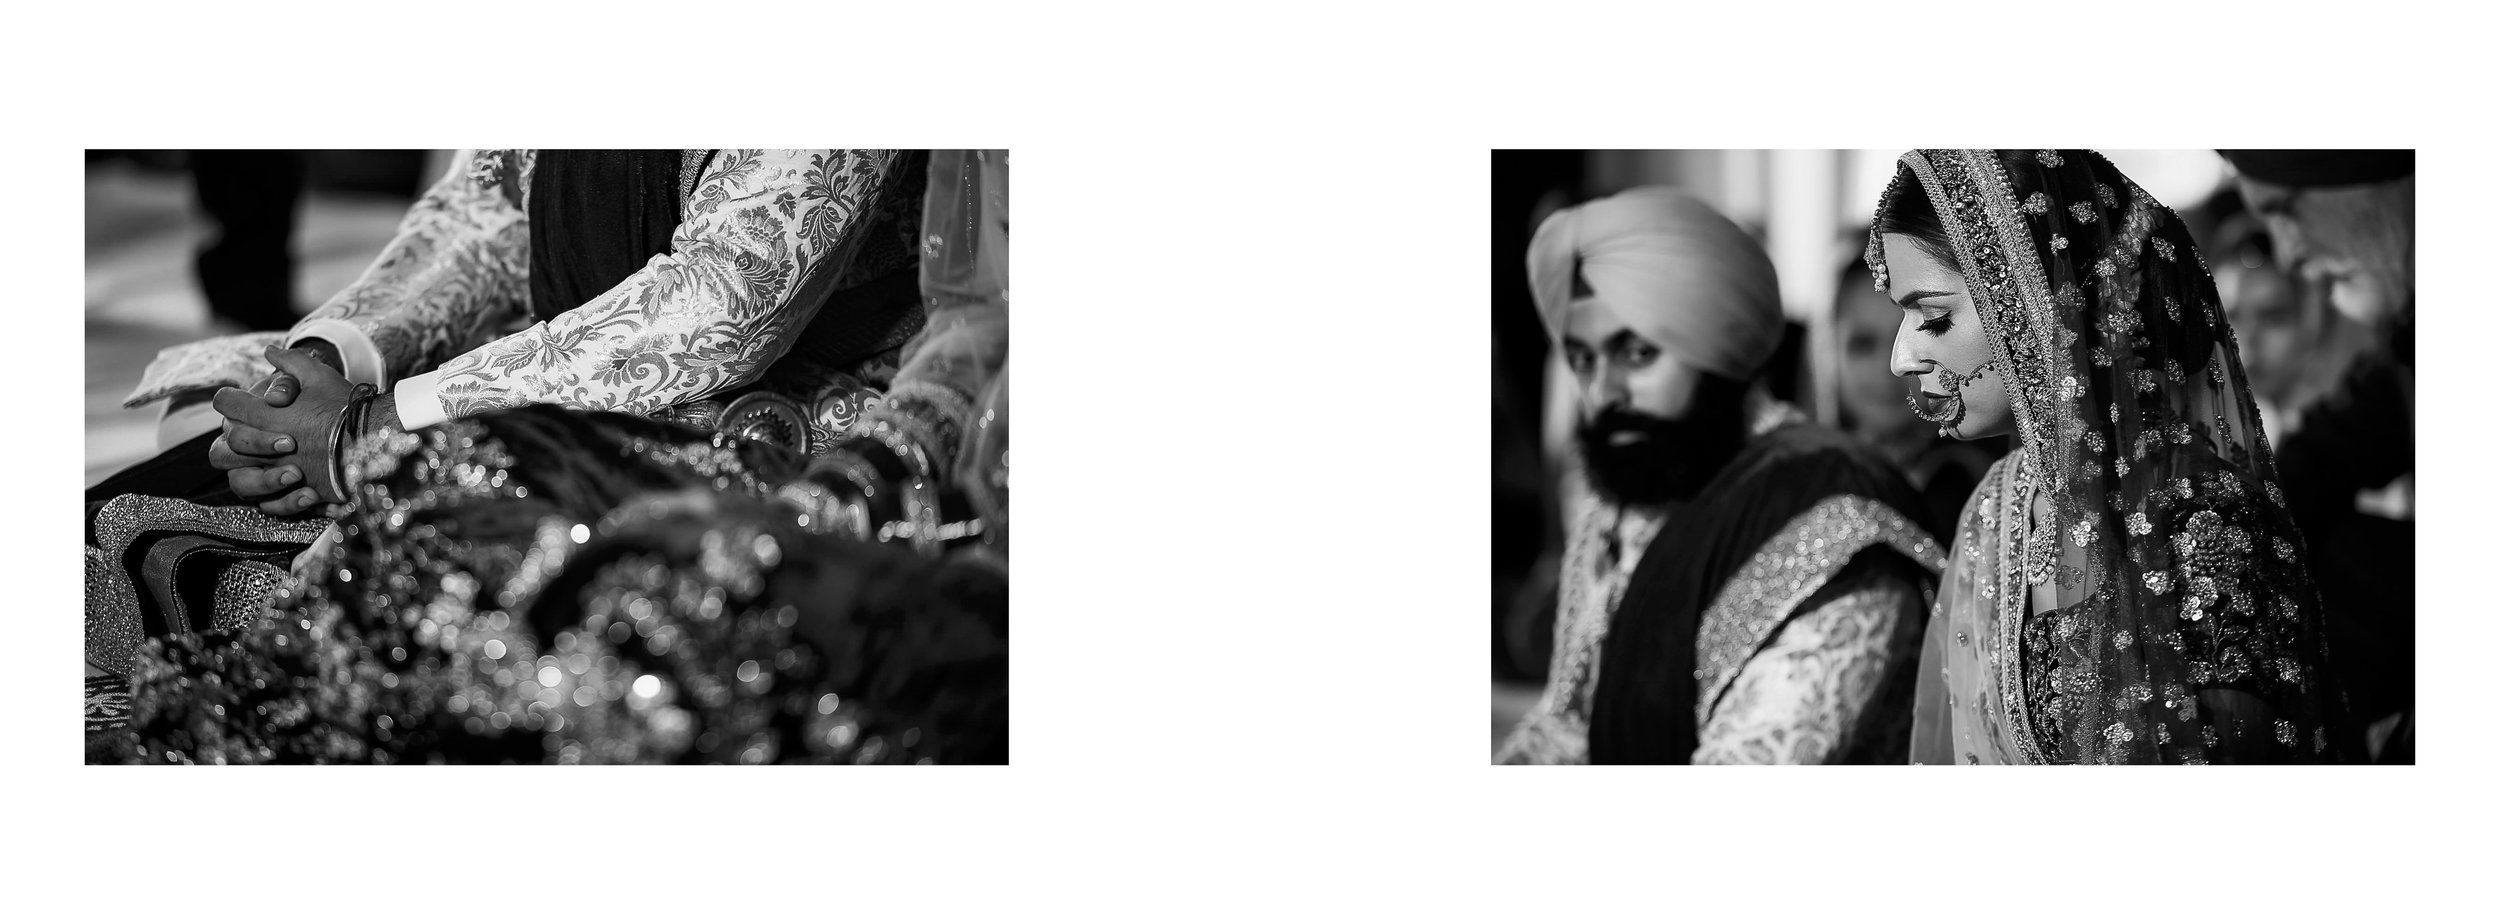 Sikh Wedding - Jaspreet and Indy-30.jpg